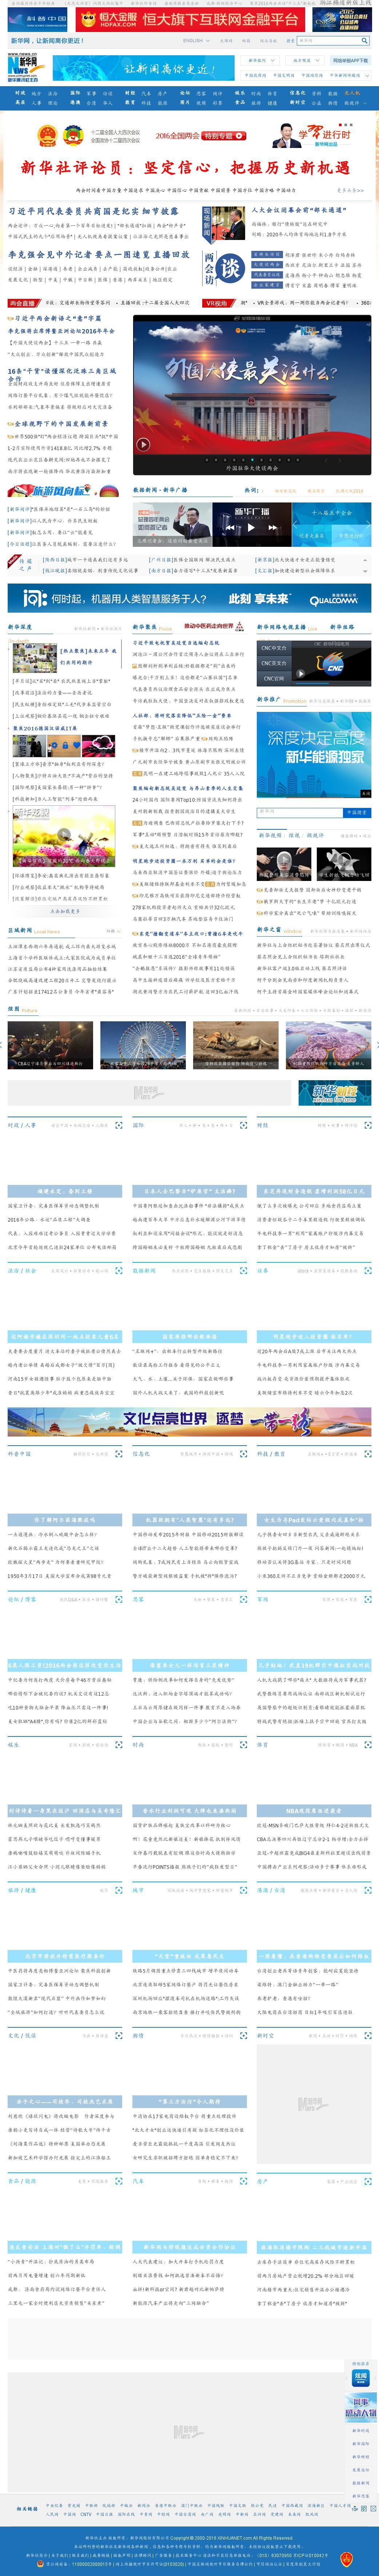 Xinhua at Thursday March 17, 2016, 7:27 a.m. UTC